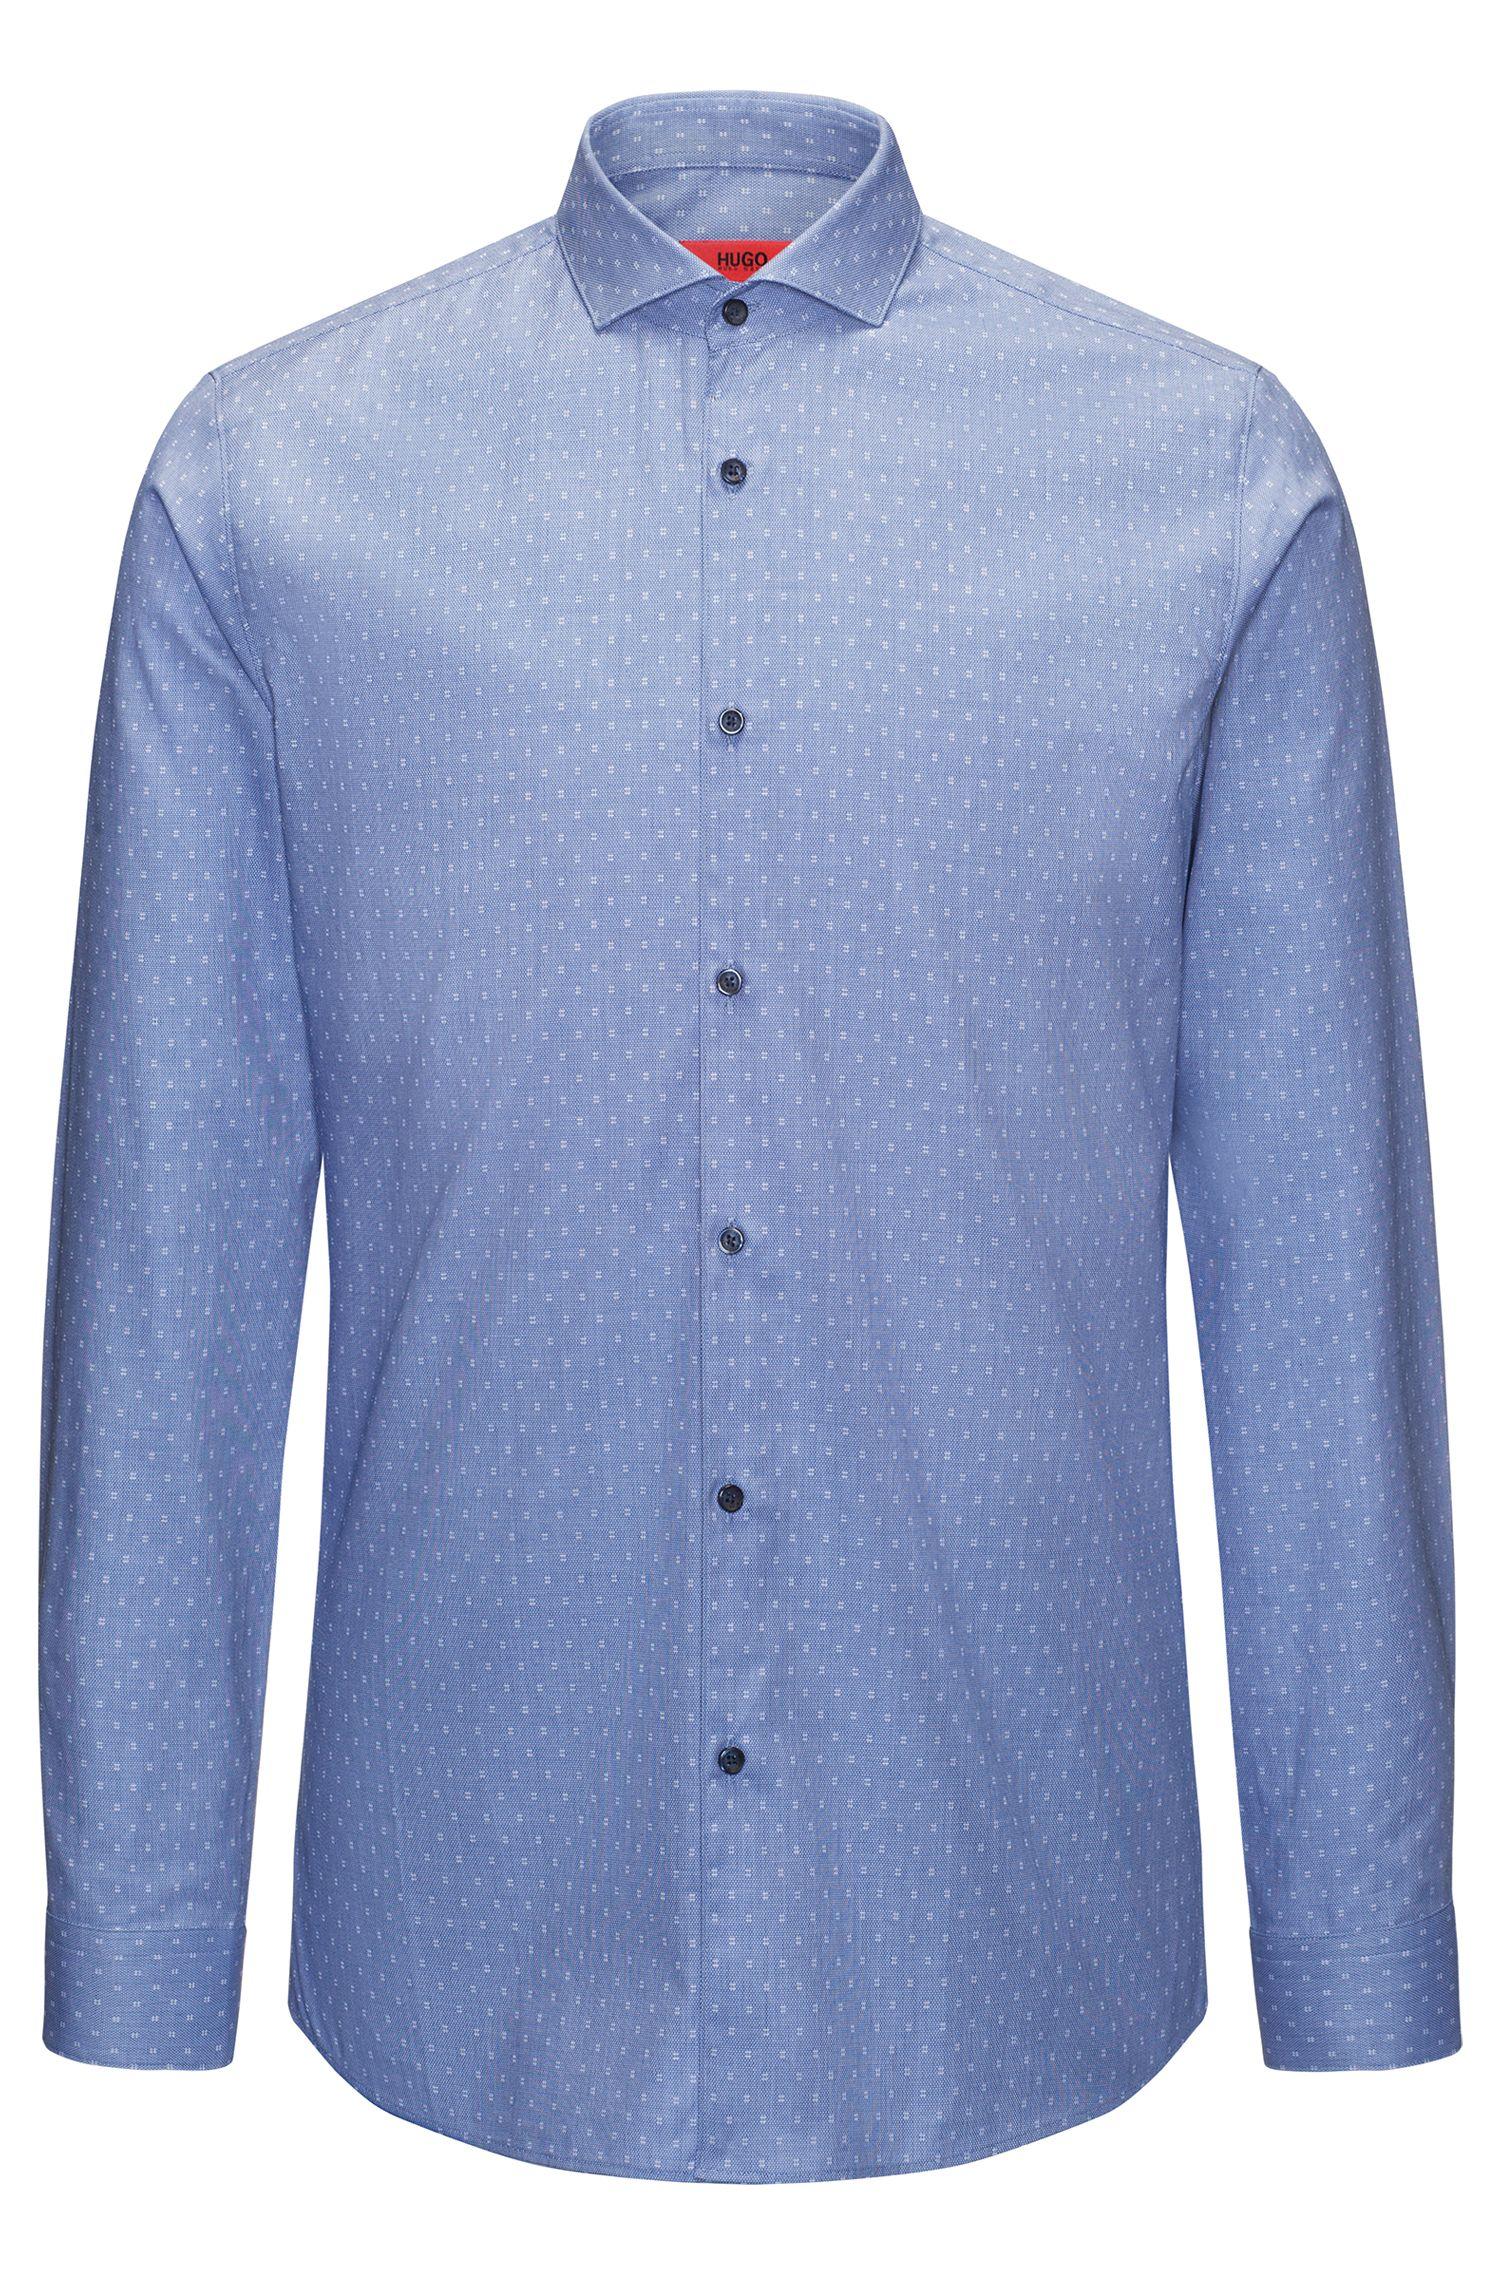 Hashtag Cotton Sport Shirt, Extra Slim Fit | Erriko